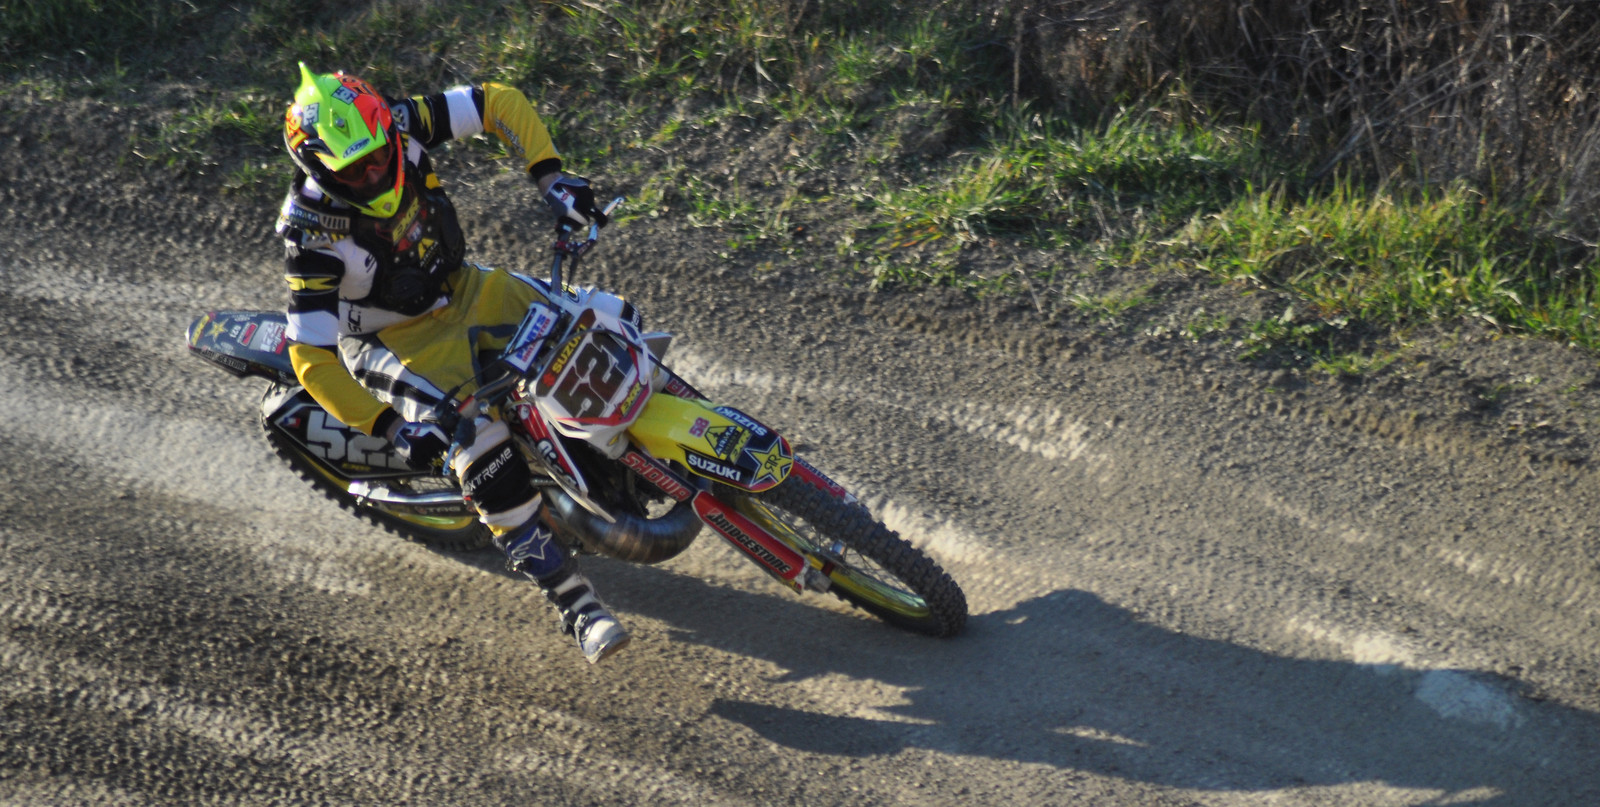 12_31_2011 - effettoxtremo - Motocross Pictures - Vital MX